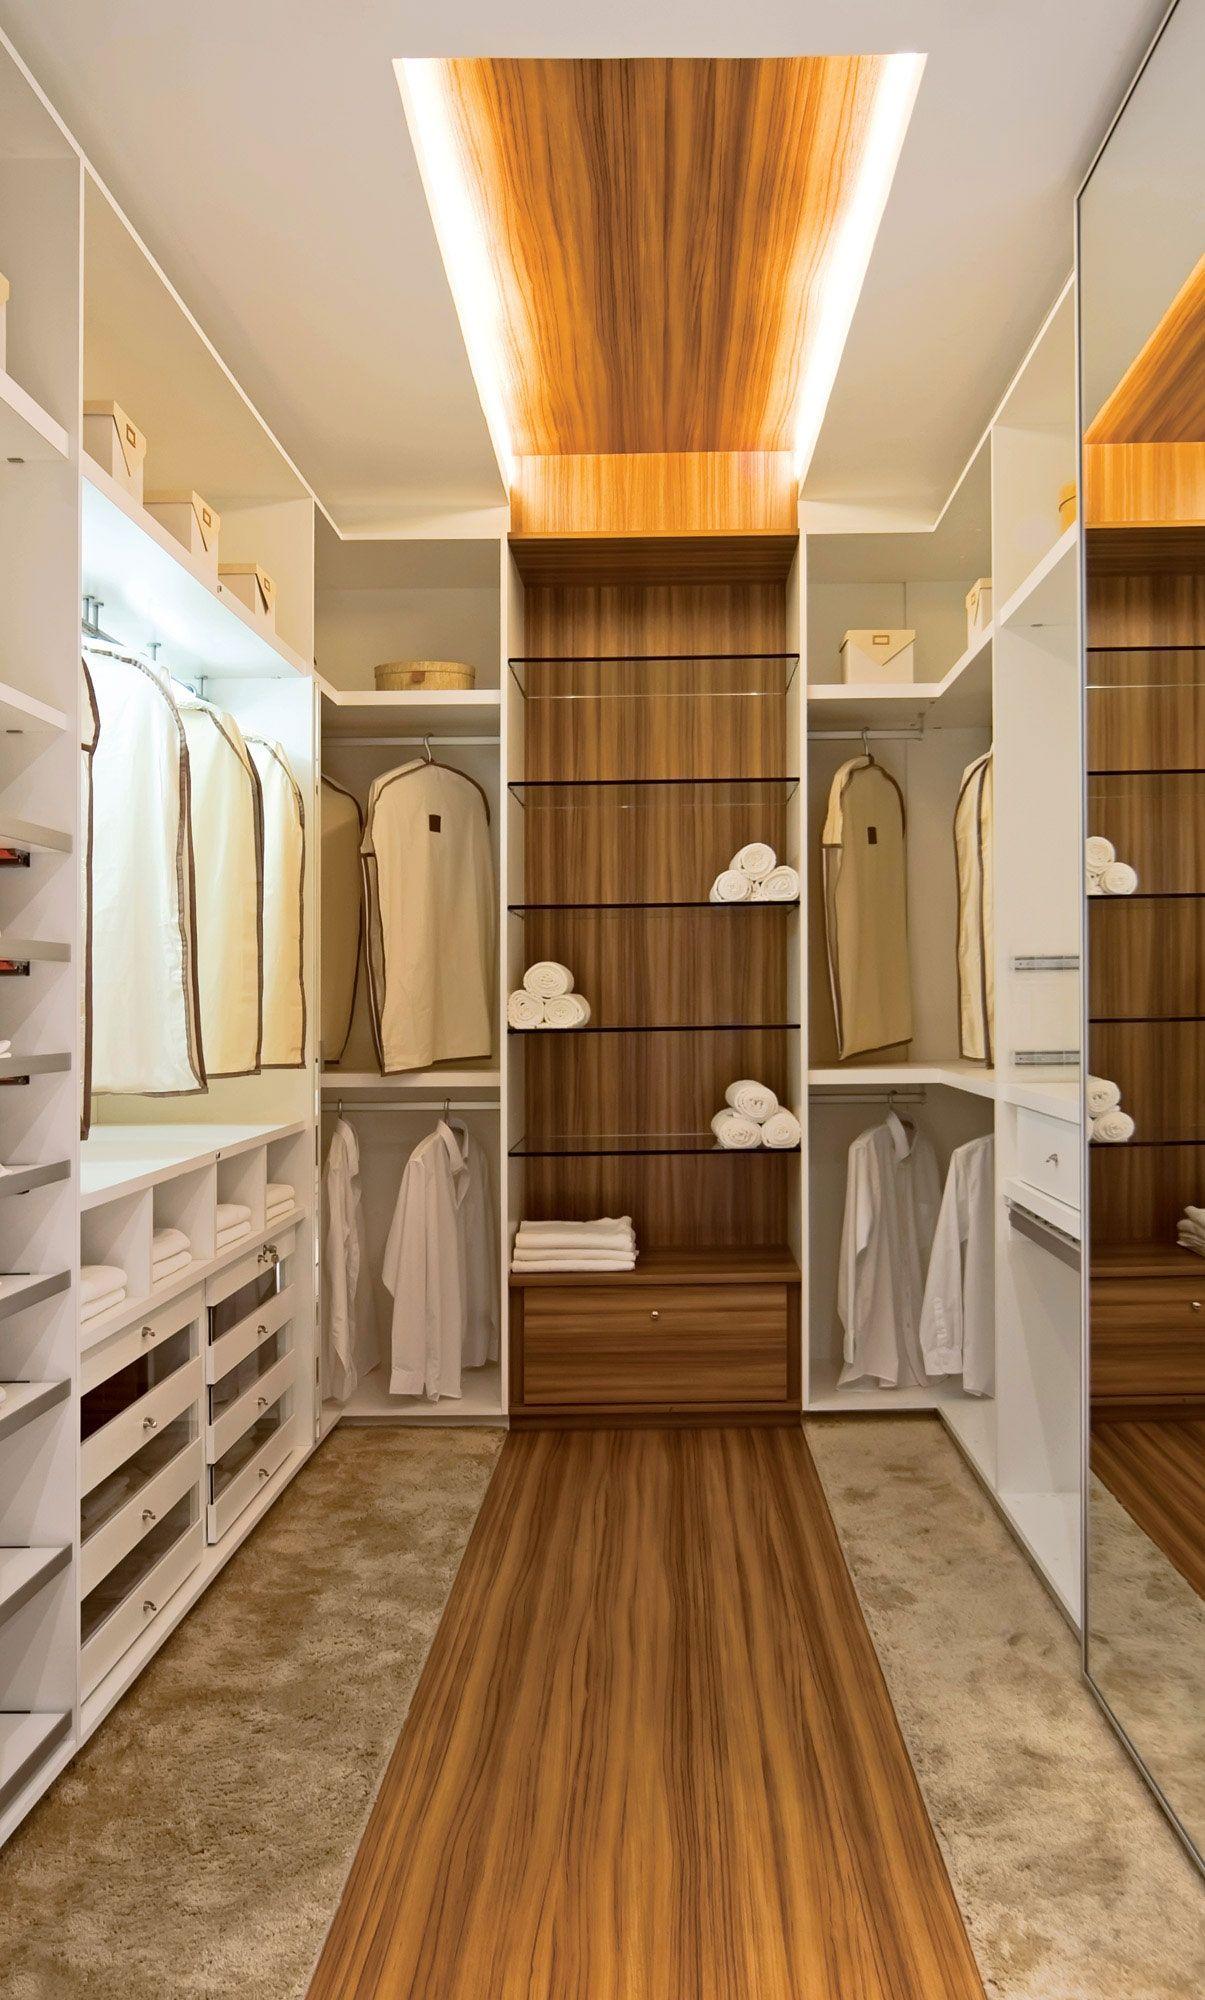 lacca design qualidade e estilo id walk in closet his suitably pinterest gardrobe. Black Bedroom Furniture Sets. Home Design Ideas